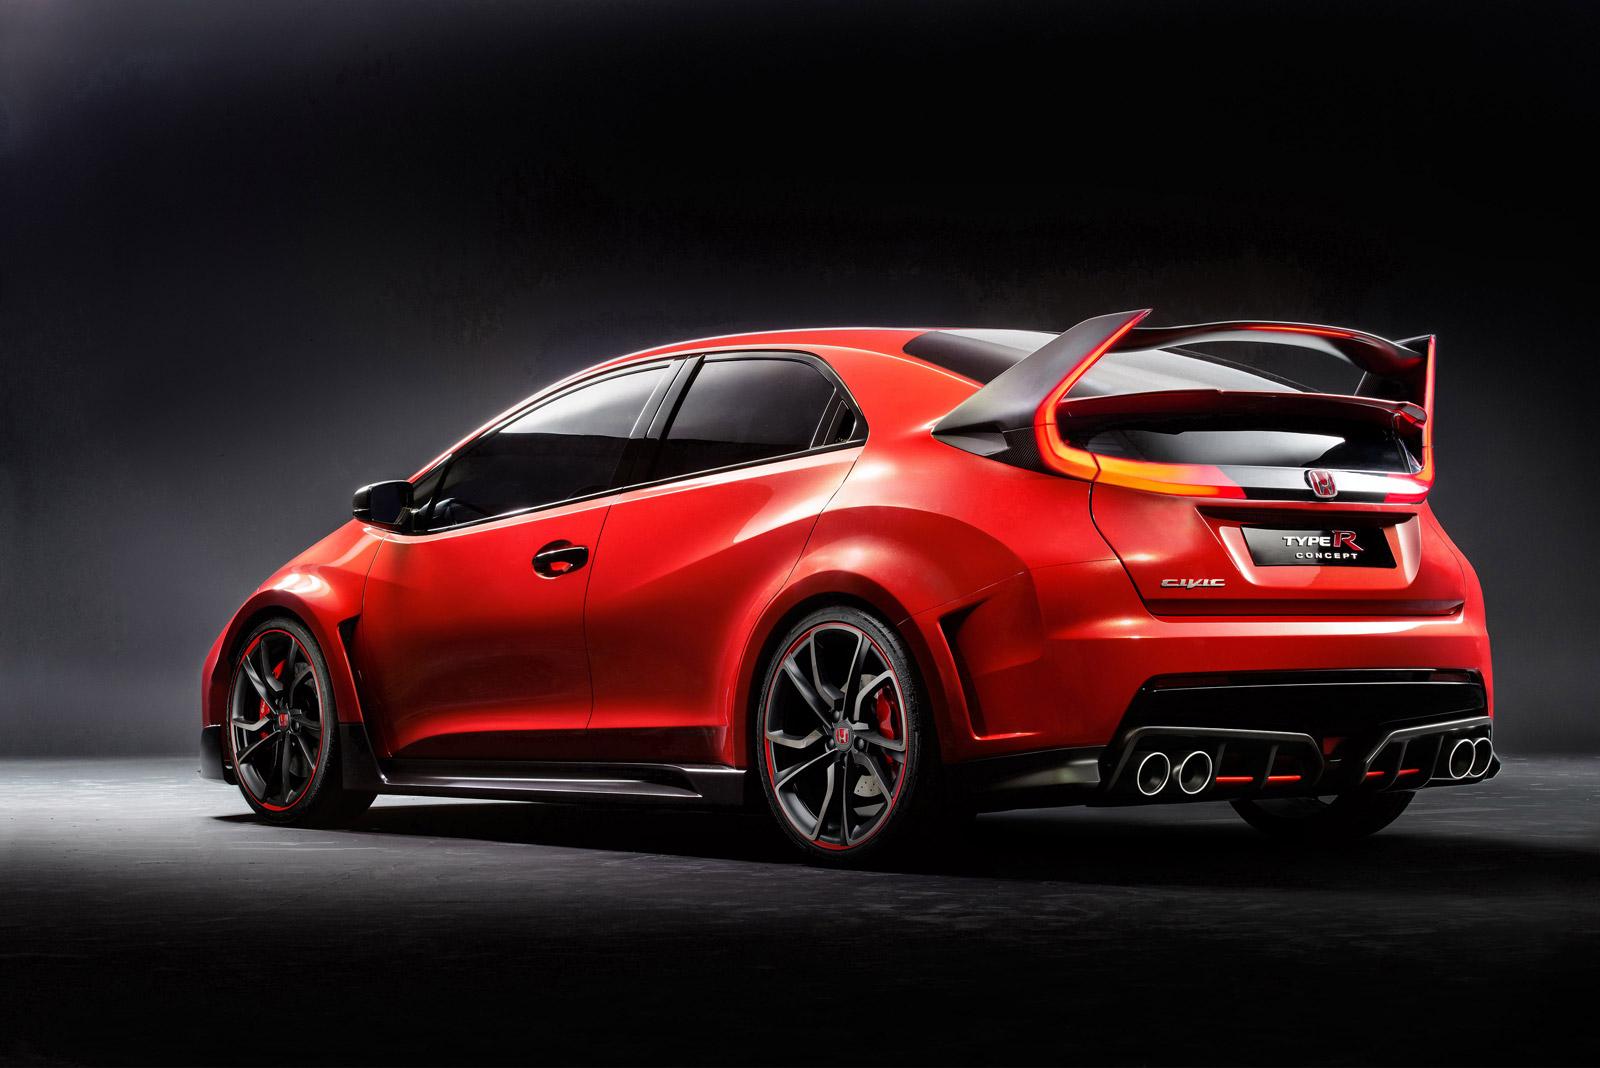 Smart's U.S. Plans, Scion Drops iQ, Honda Civic Type R: What's New @ The Car Connection